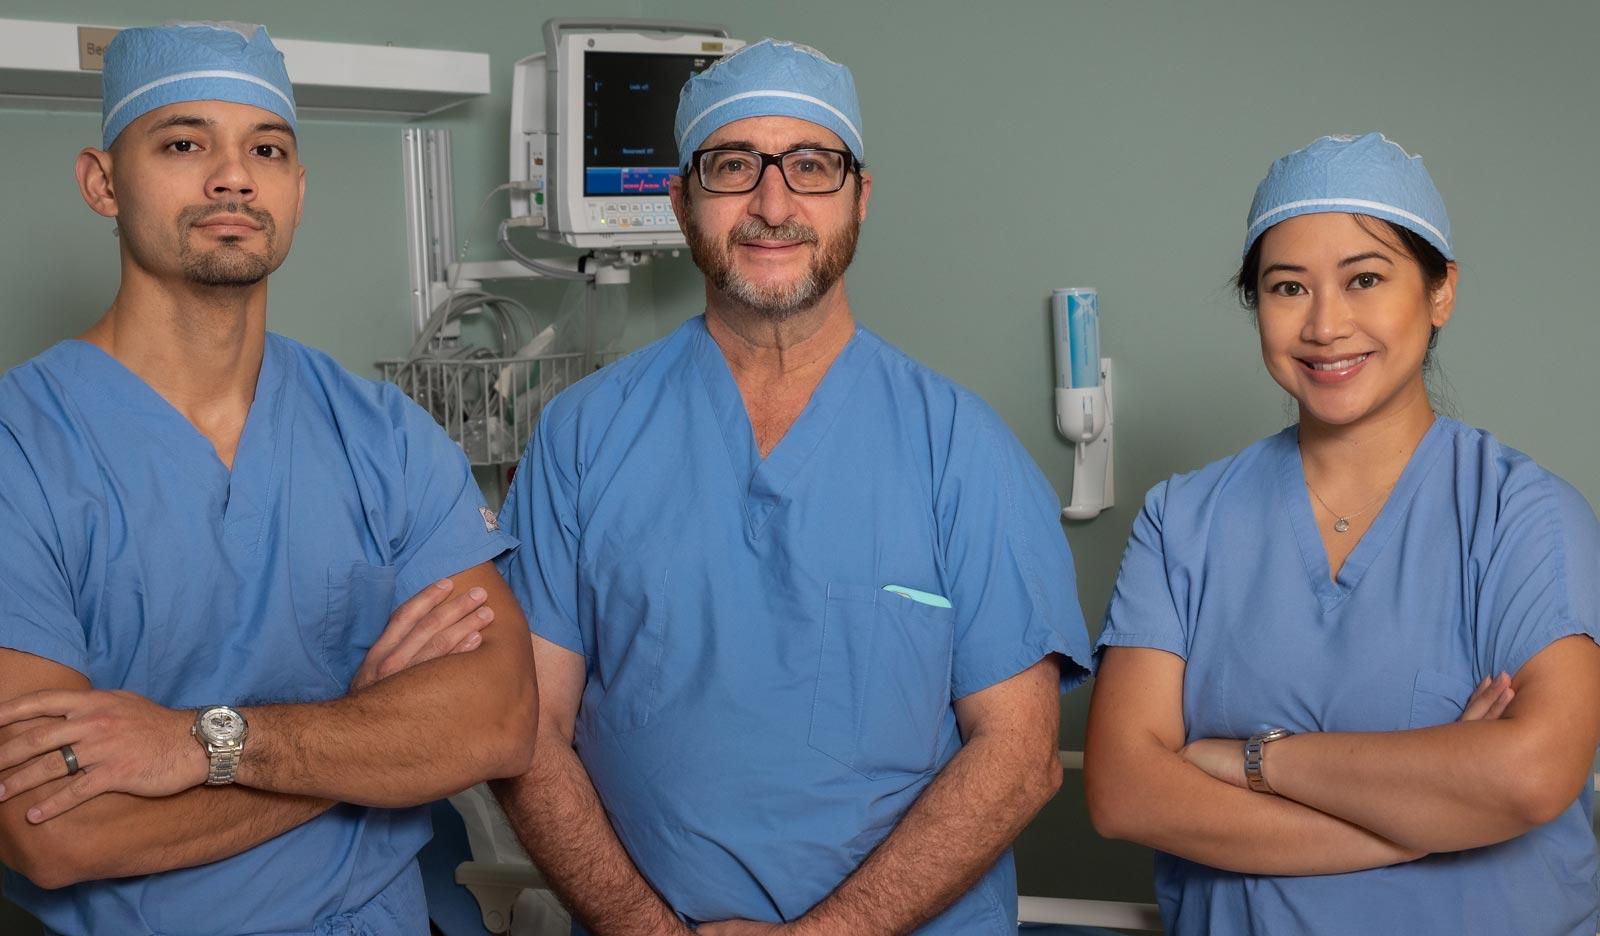 Three Doctors in Scrubs